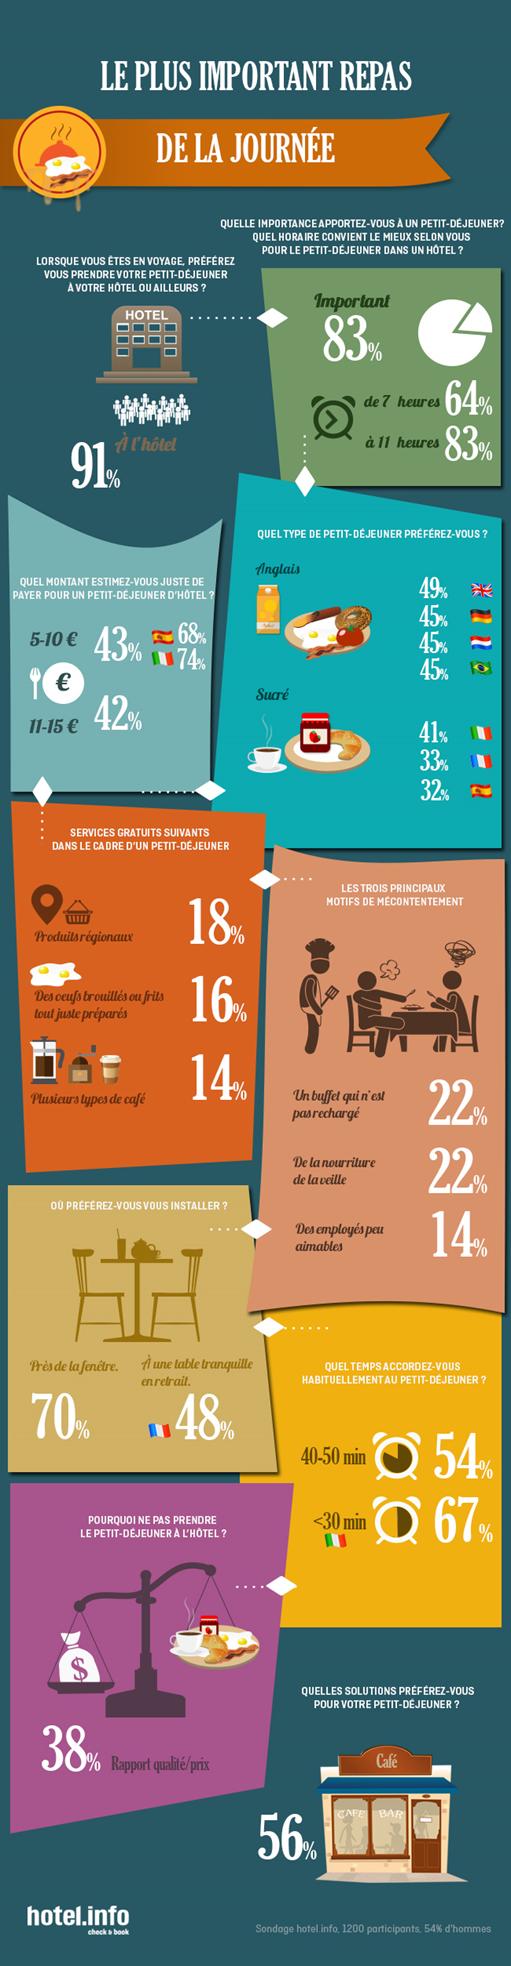 infographie hotelinfo petit-déjeuner